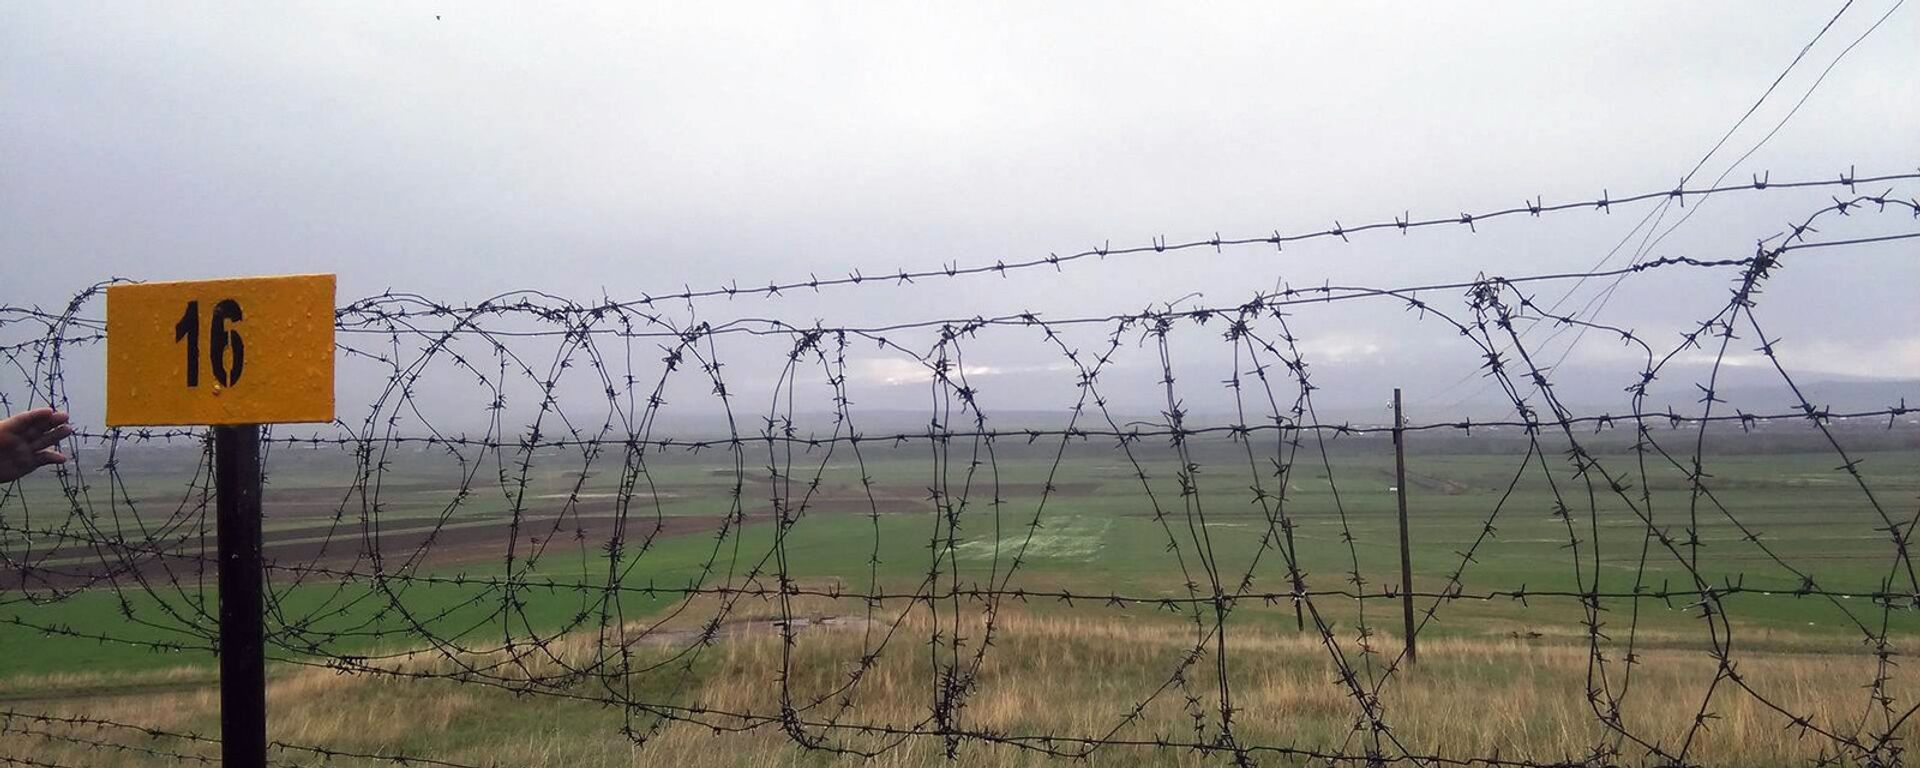 Армяно-турецкая граница - Sputnik Армения, 1920, 16.04.2021